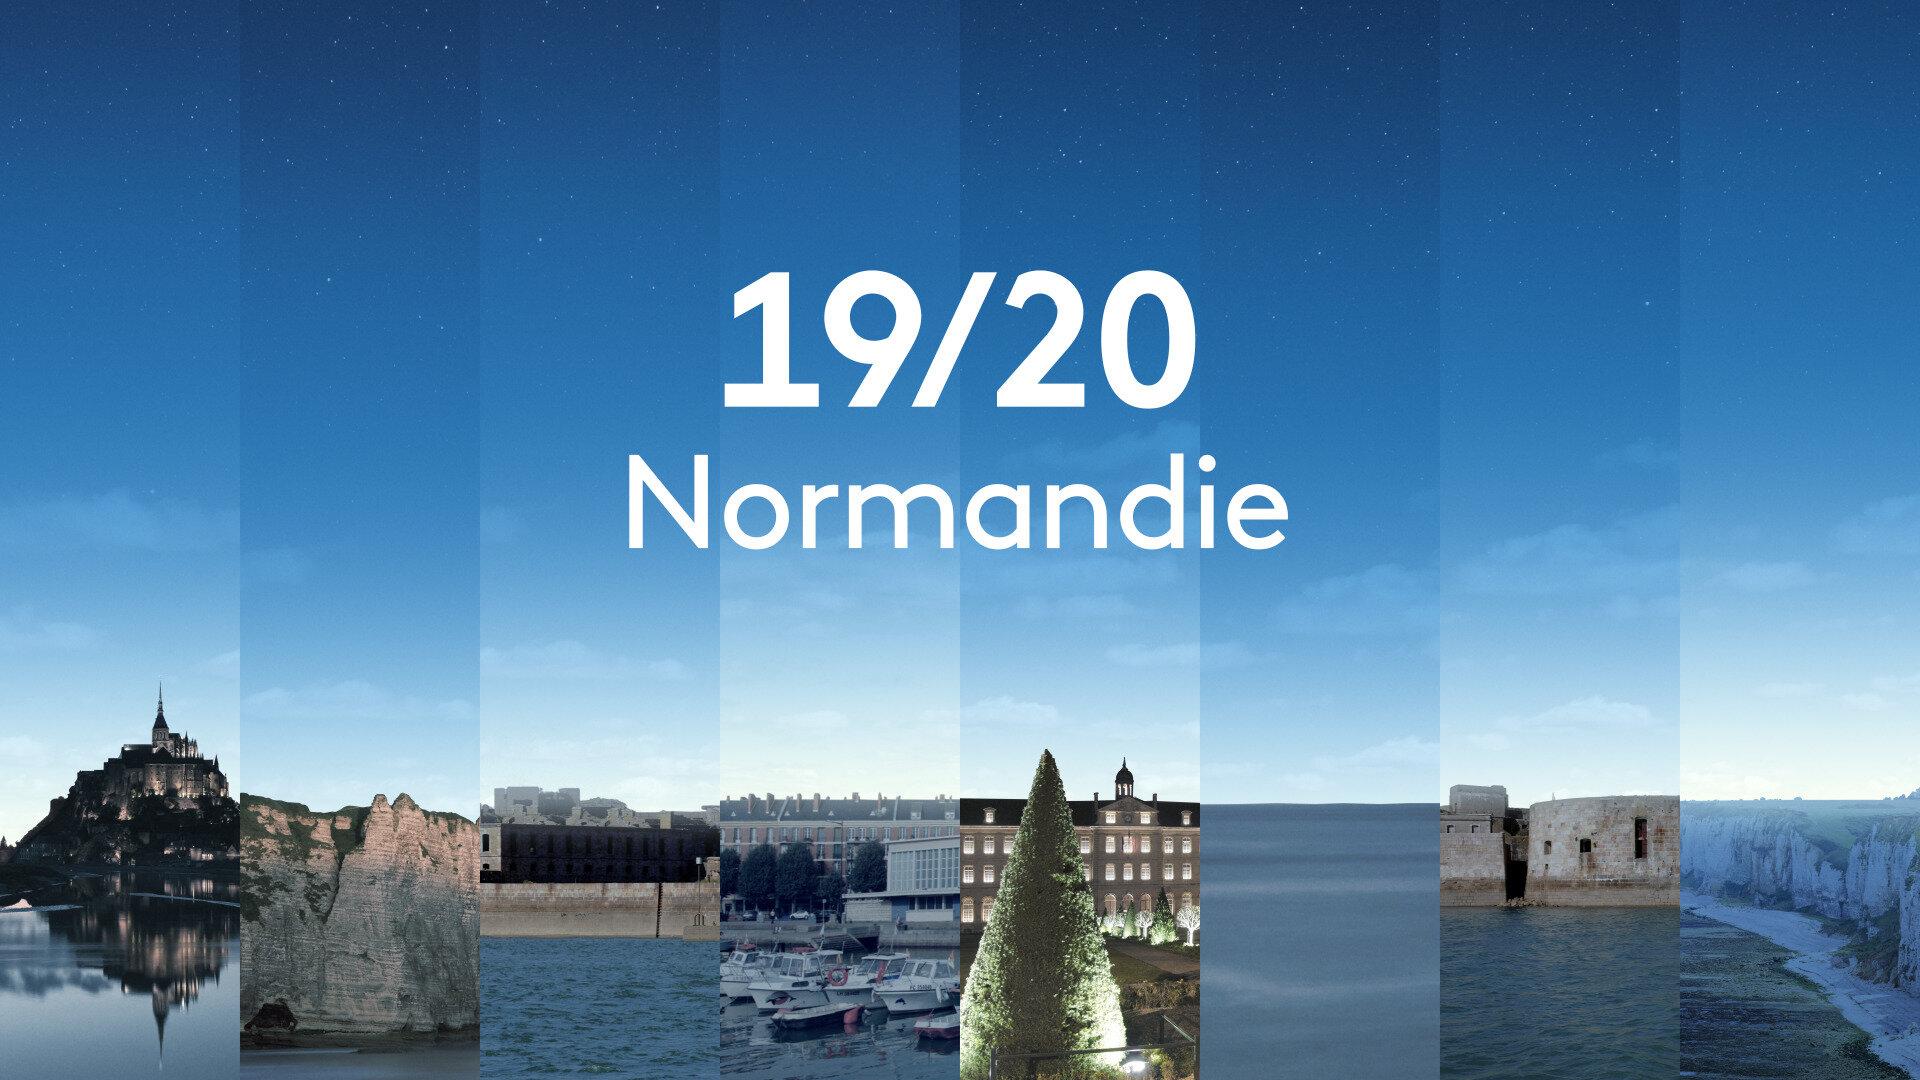 19/20 Normandie